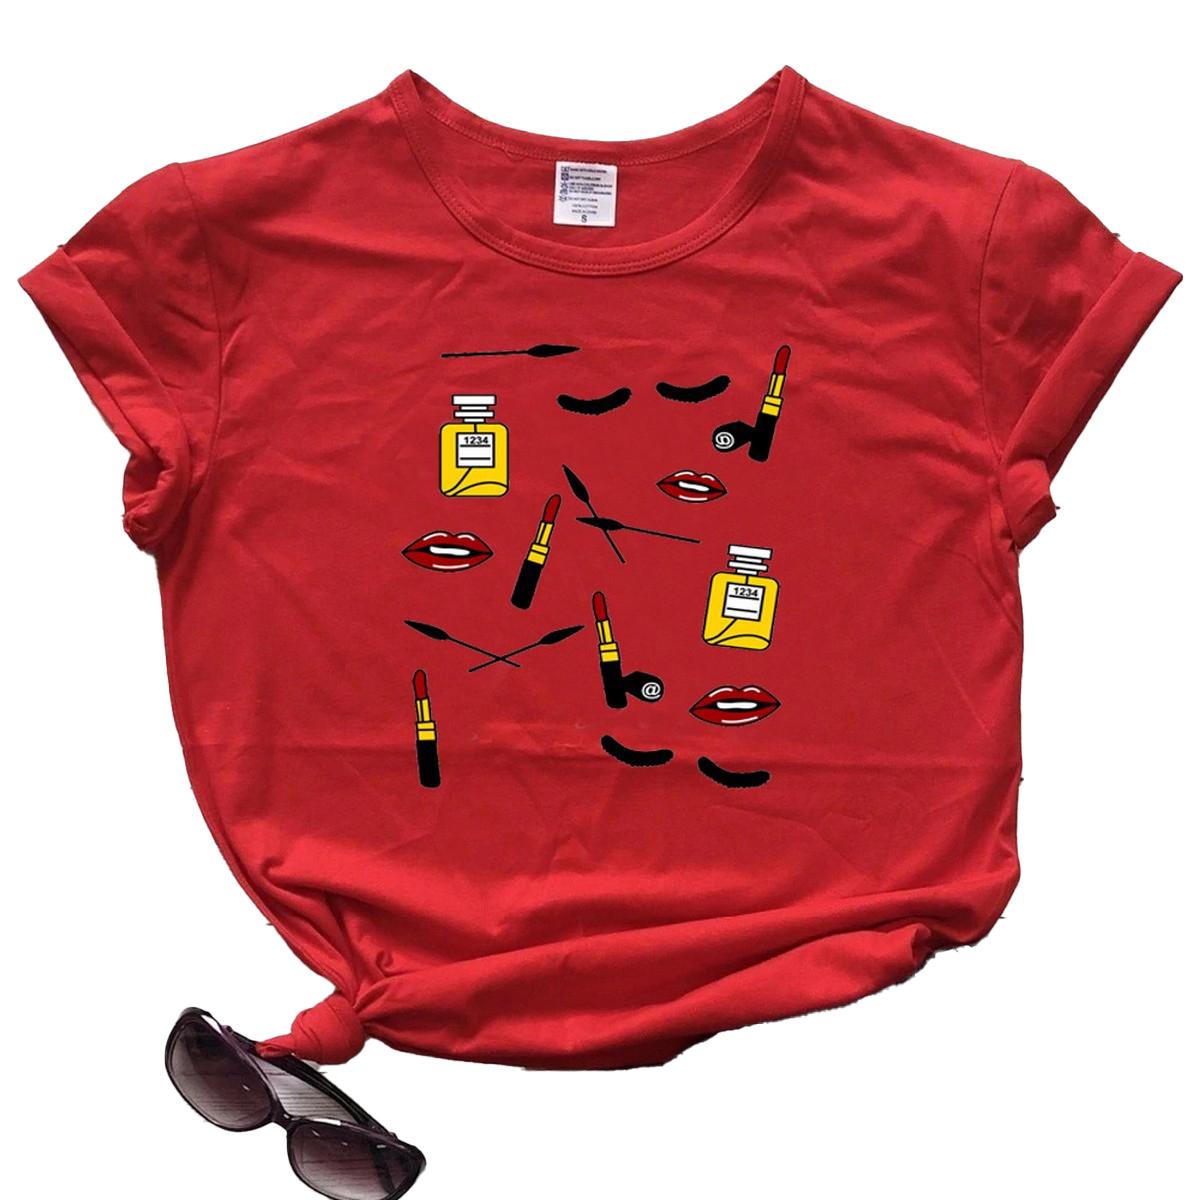 Makeup Printed T shirt For Women